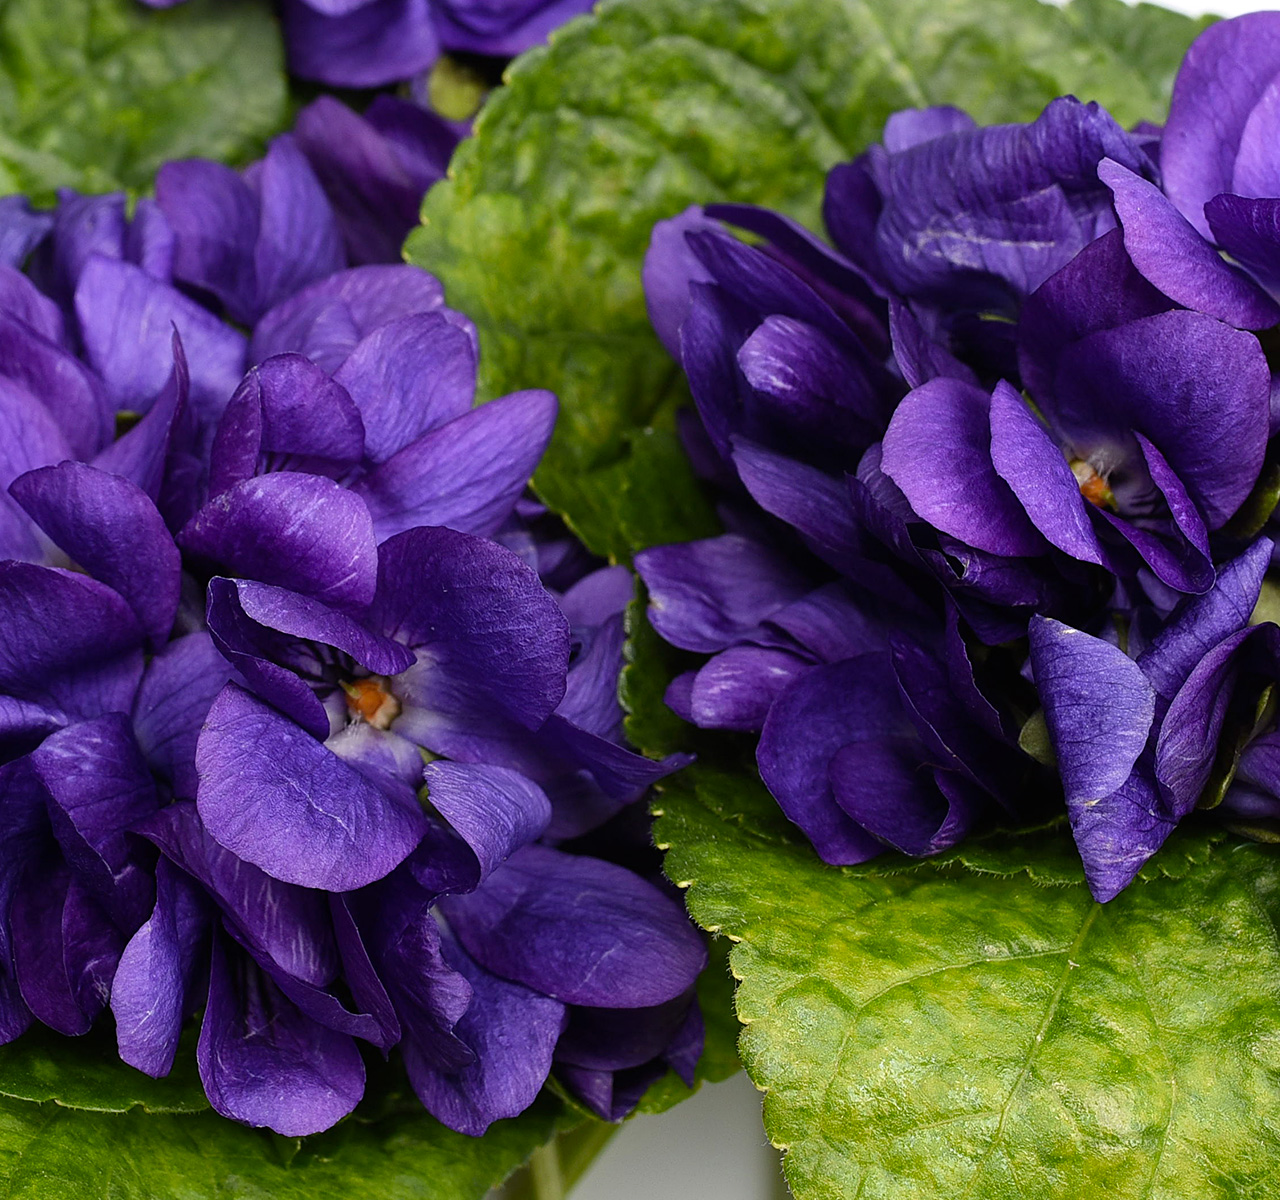 Kubo Pâtisserie - Violettes